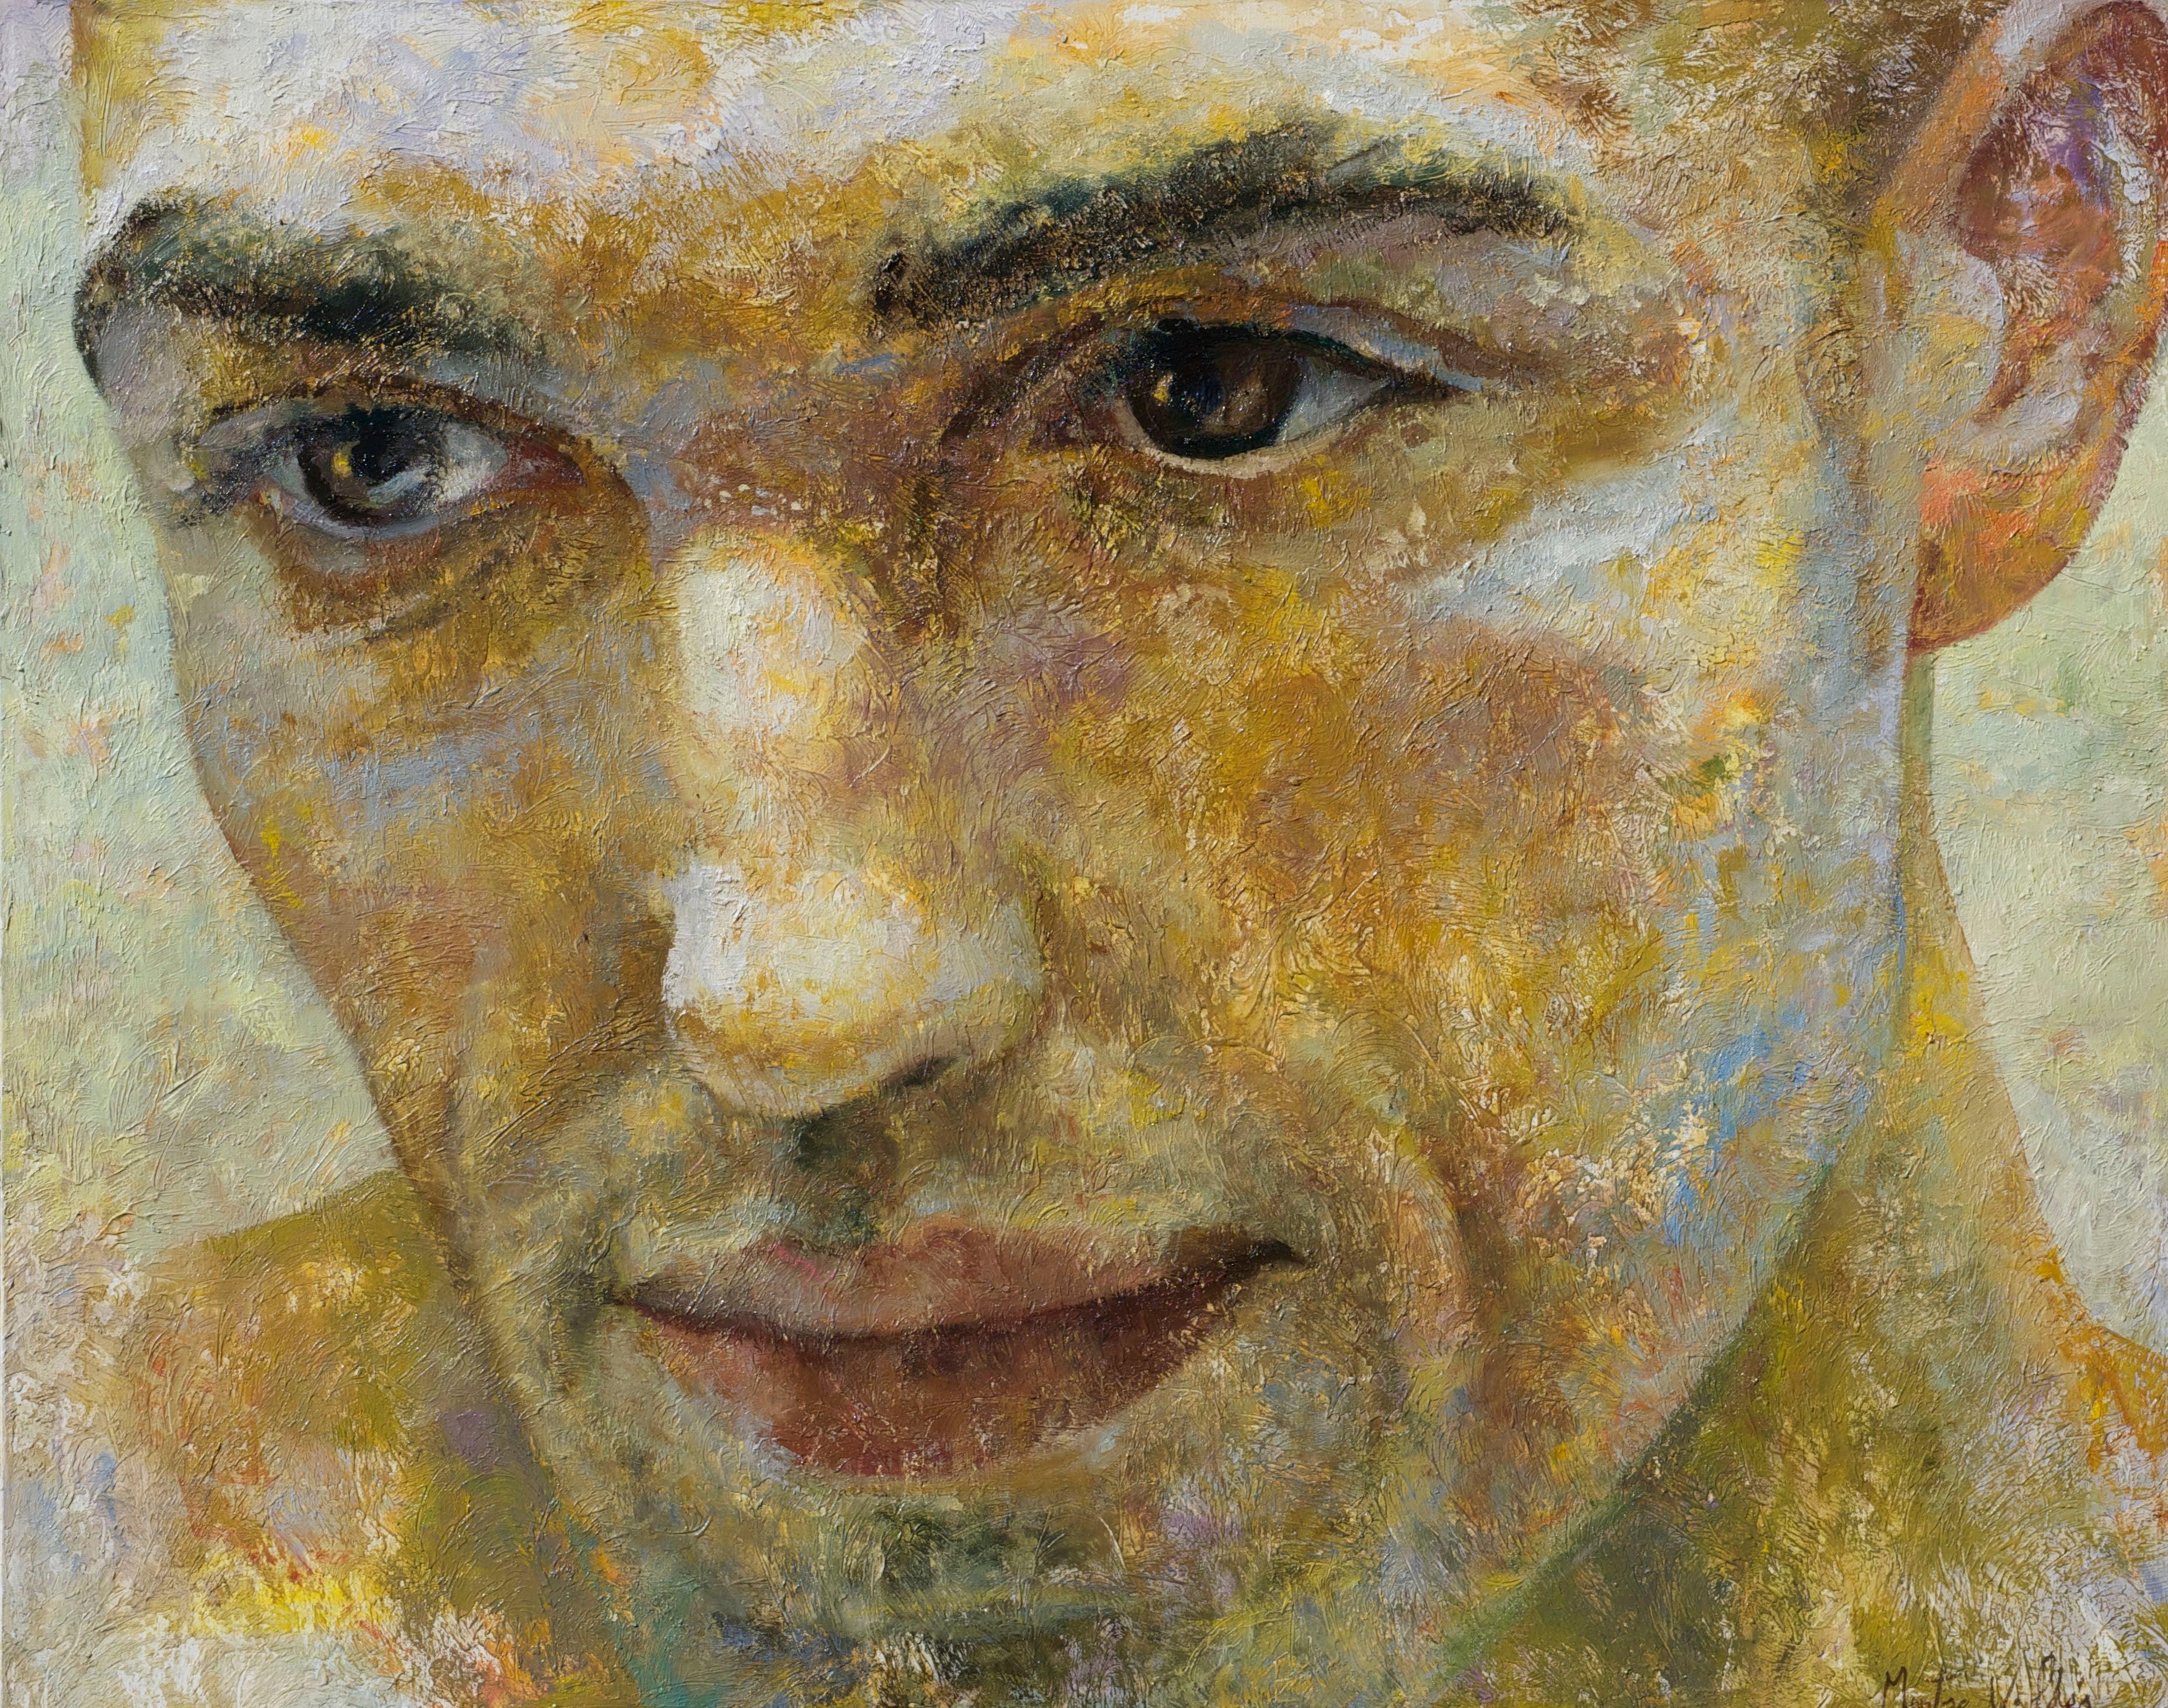 1-3-15 - 21st Century, Contemporary, Portrait Painting, Oil on Canvas